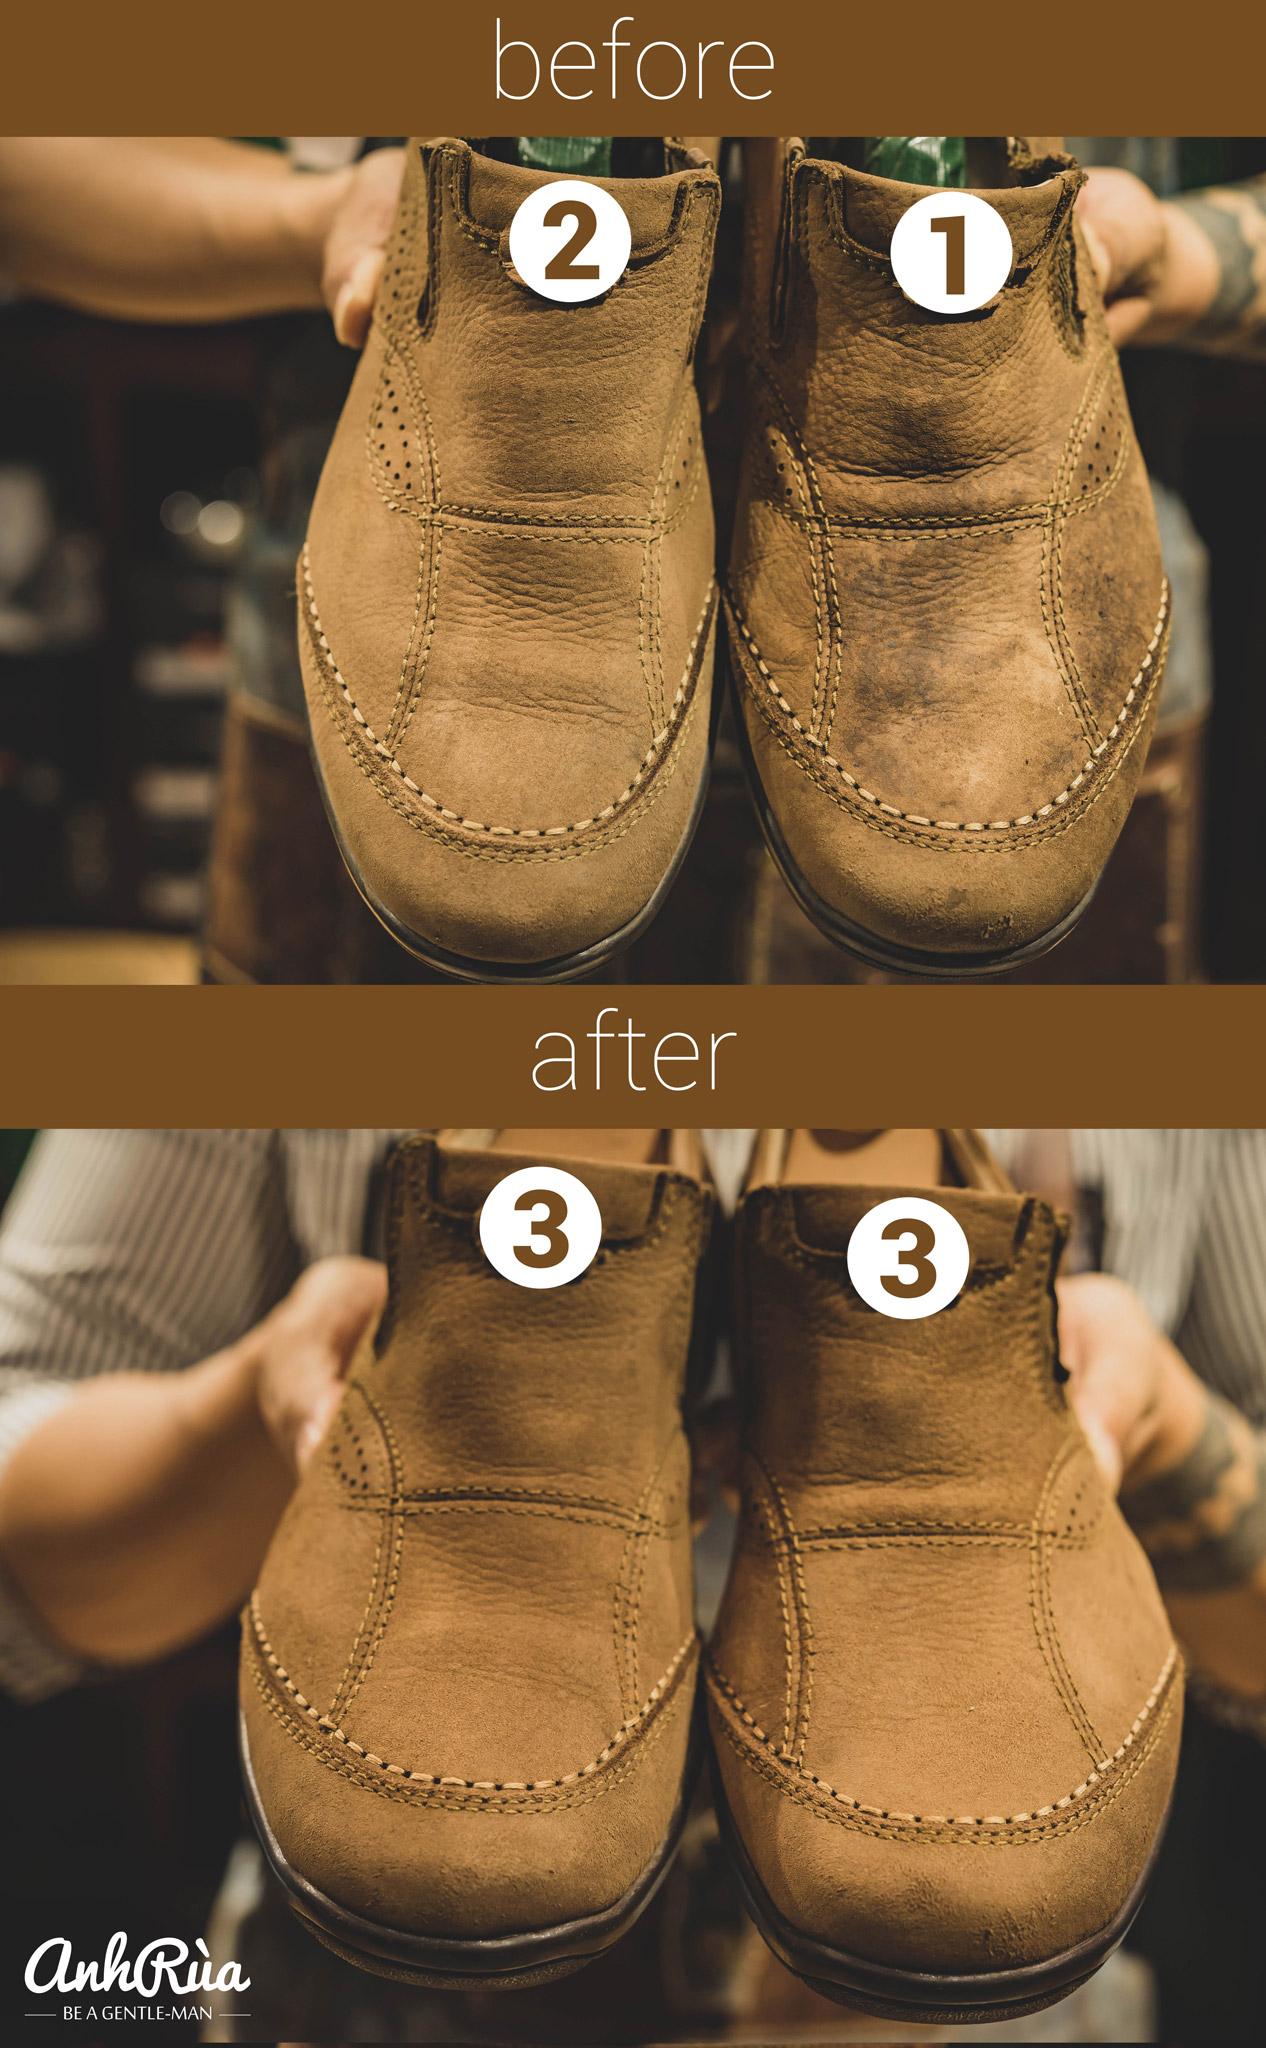 chăm sóc giày da lộn